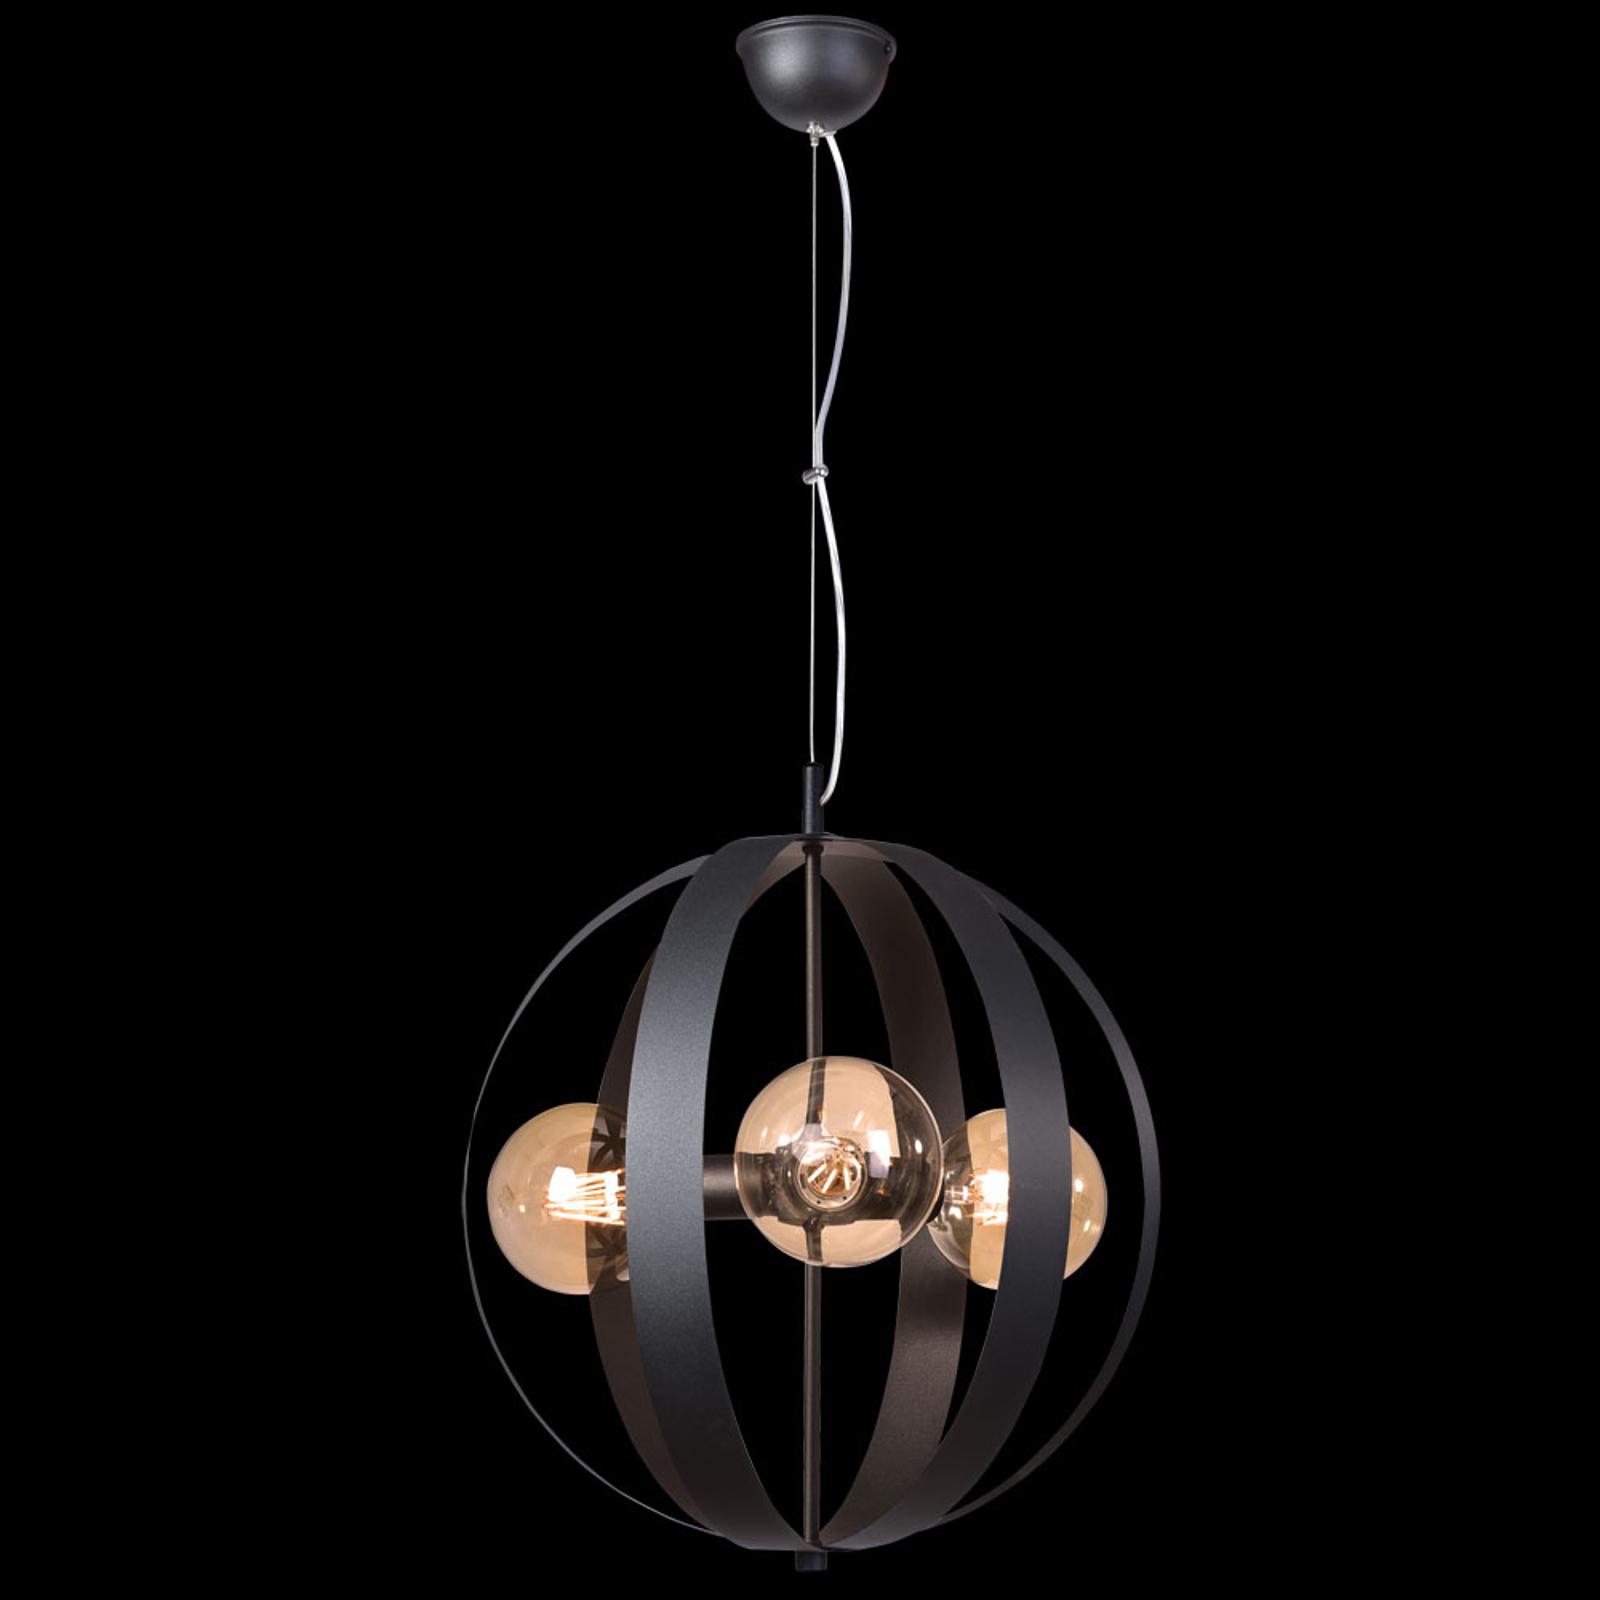 Lampa wisząca Livia, 3-punktowa, czarna